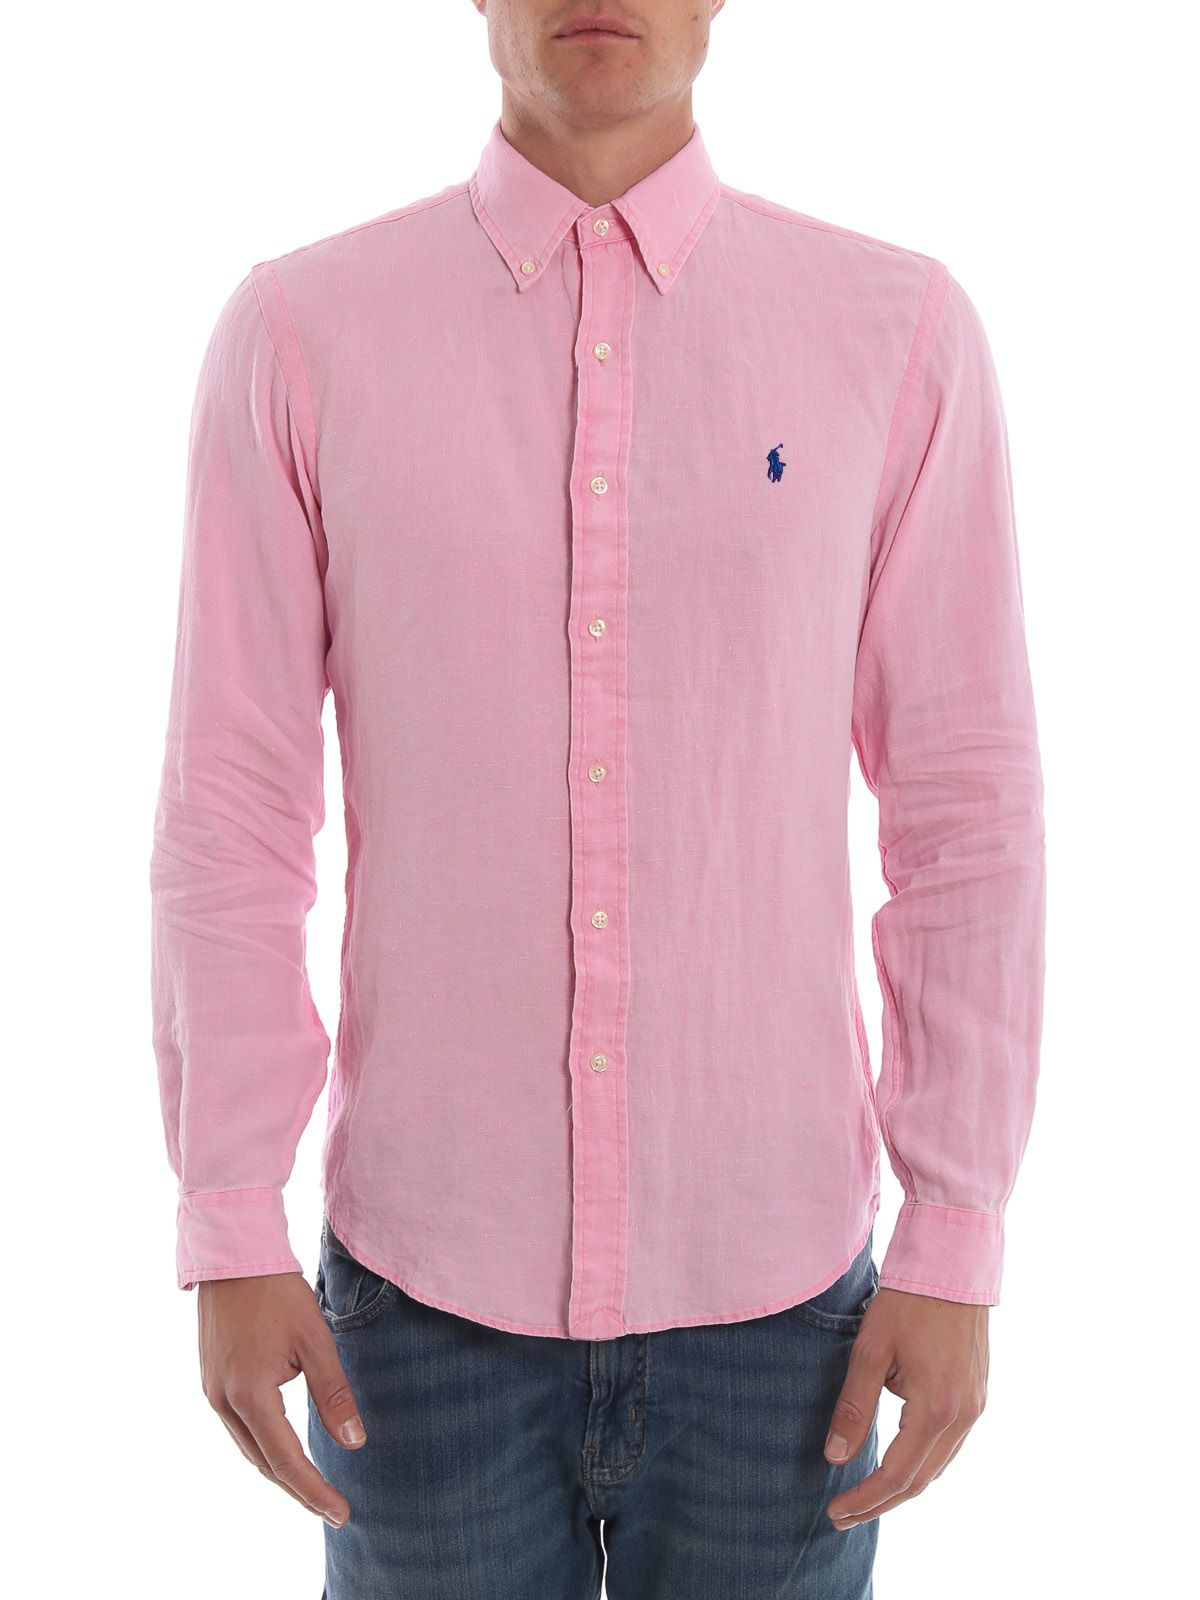 Camisa Social Linho RL Rosa